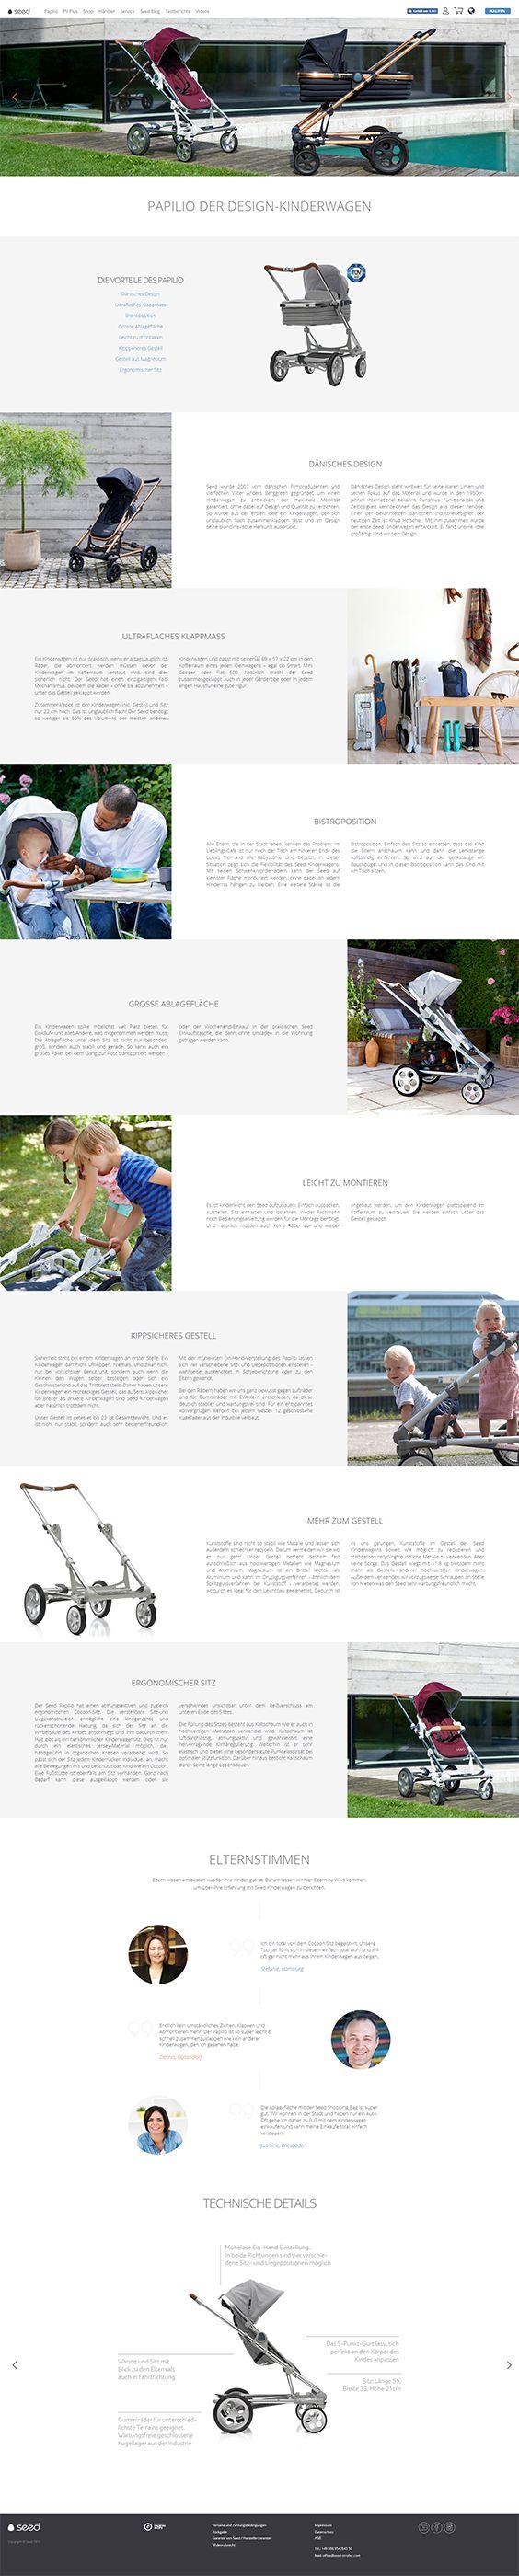 #ShopwareDesign #ShopwareTheme #ShopwareShop #eCommerce #eCommerceSoftware #eCommerceplatform #Onlineshop #Children #Baby #Kids #seedstroller #seed #skandi #danishdesign #momstyle #motherhoodthroughig